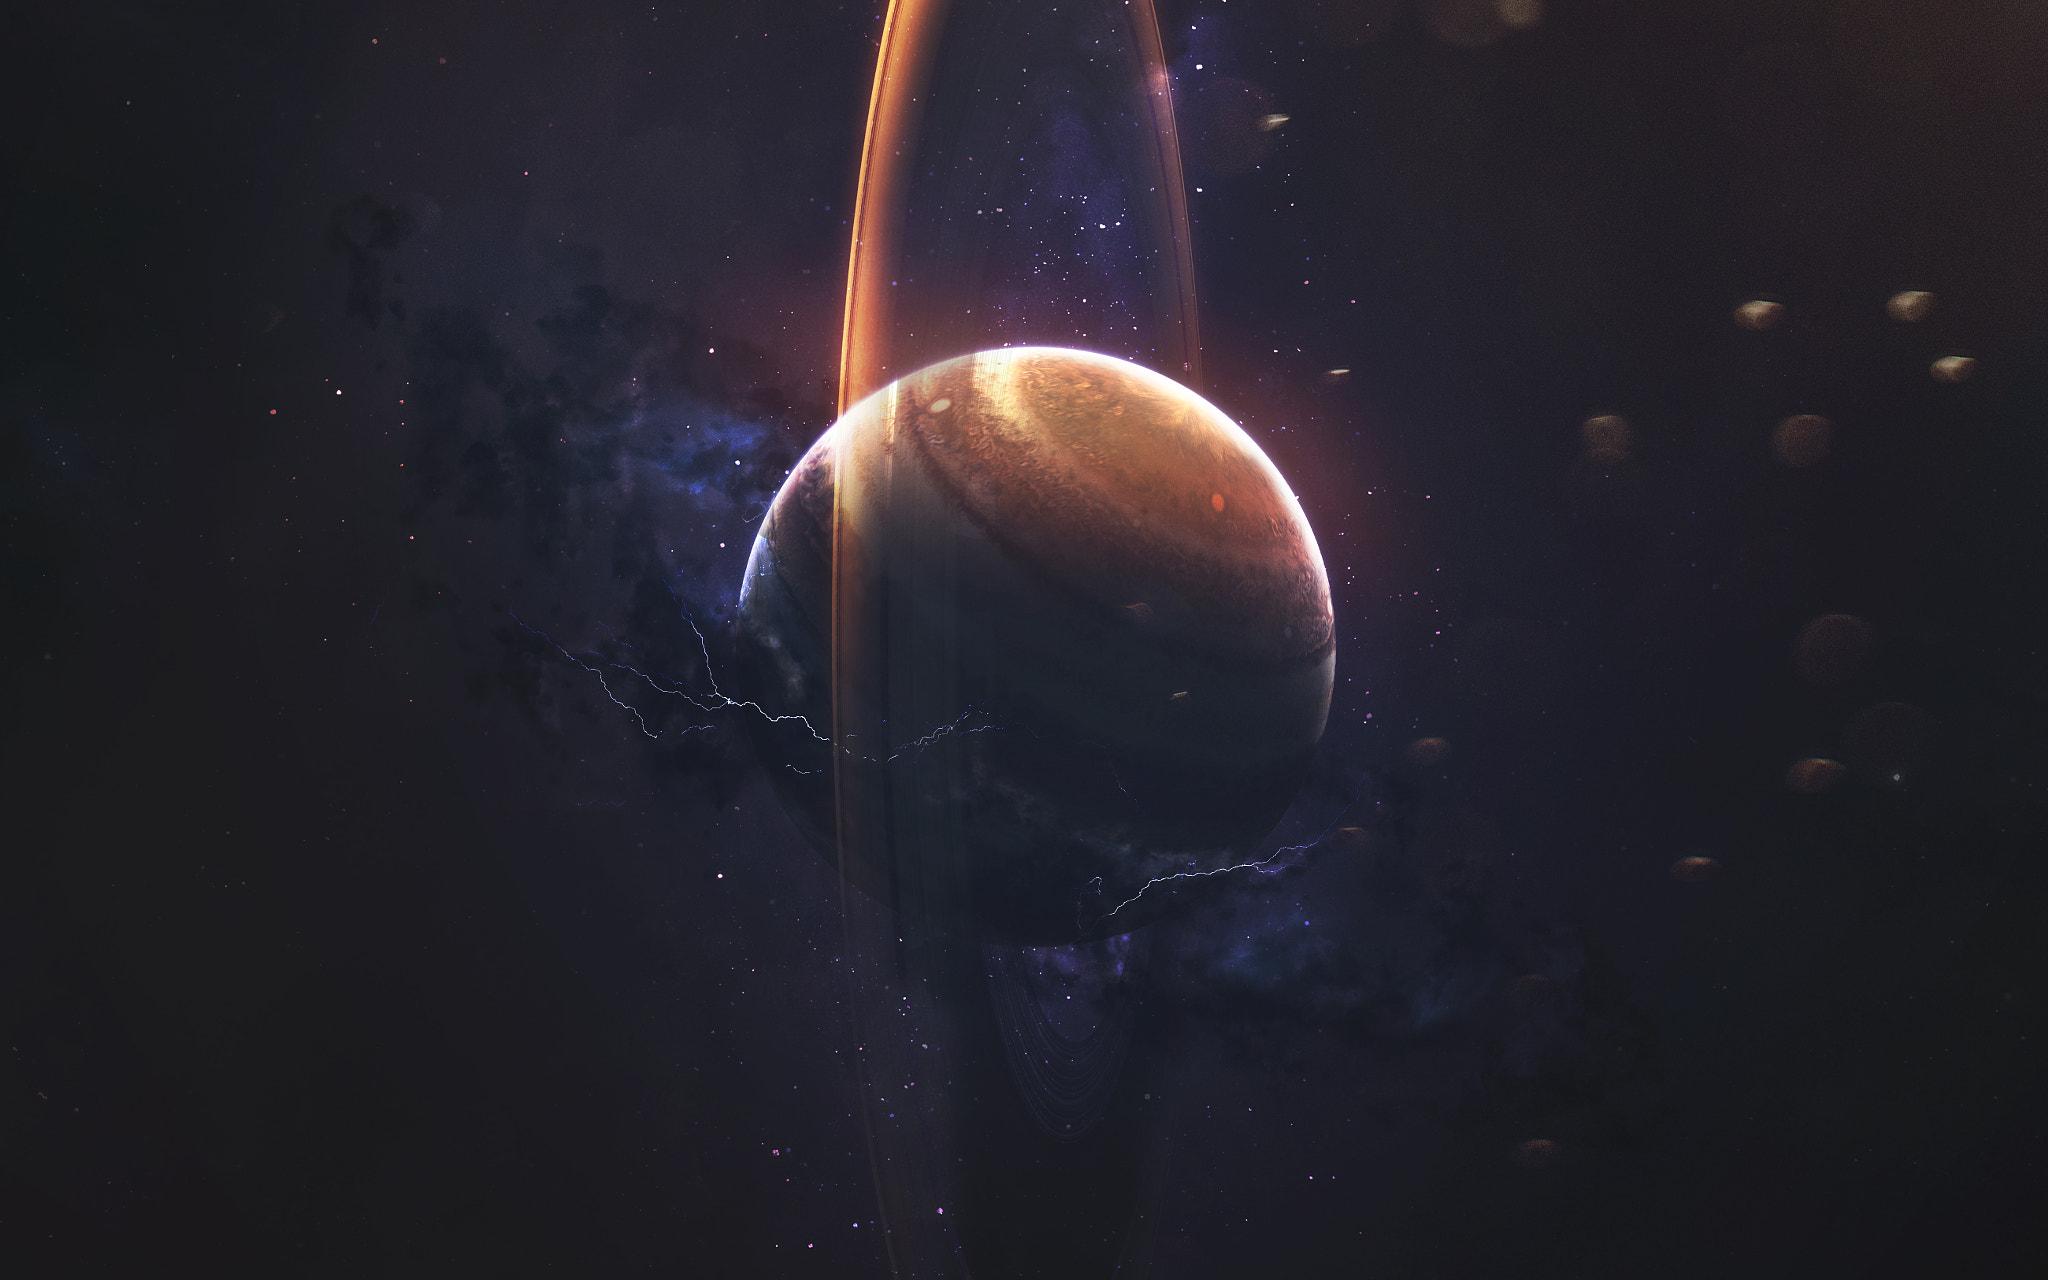 Planet Sci Fi Space 2048x1280